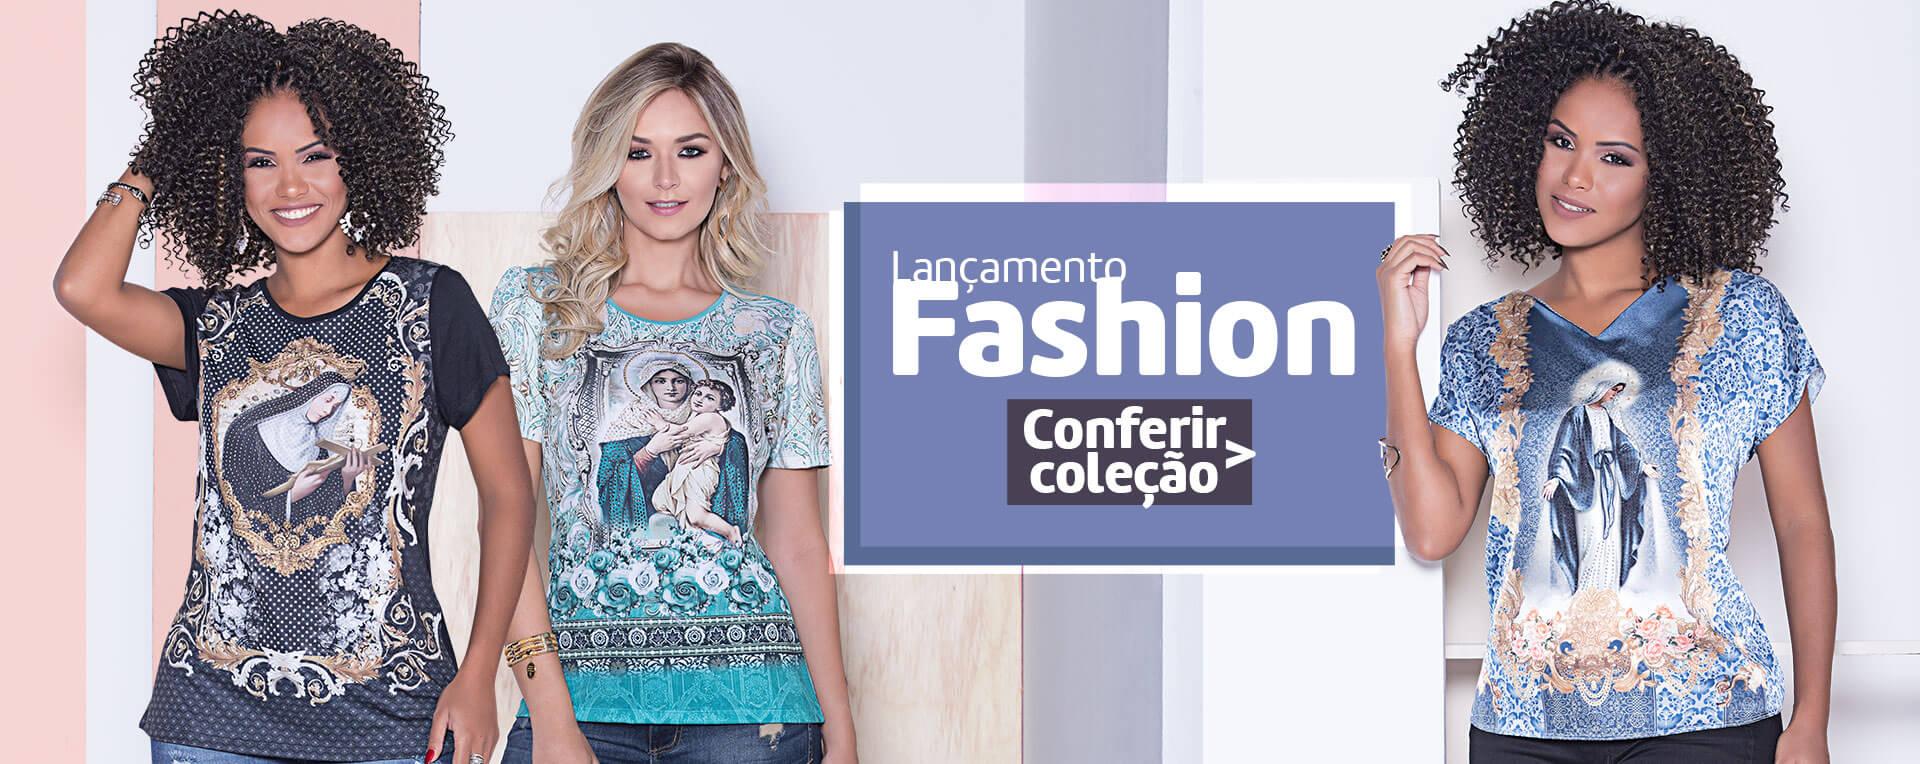 Fashion - Lançamento